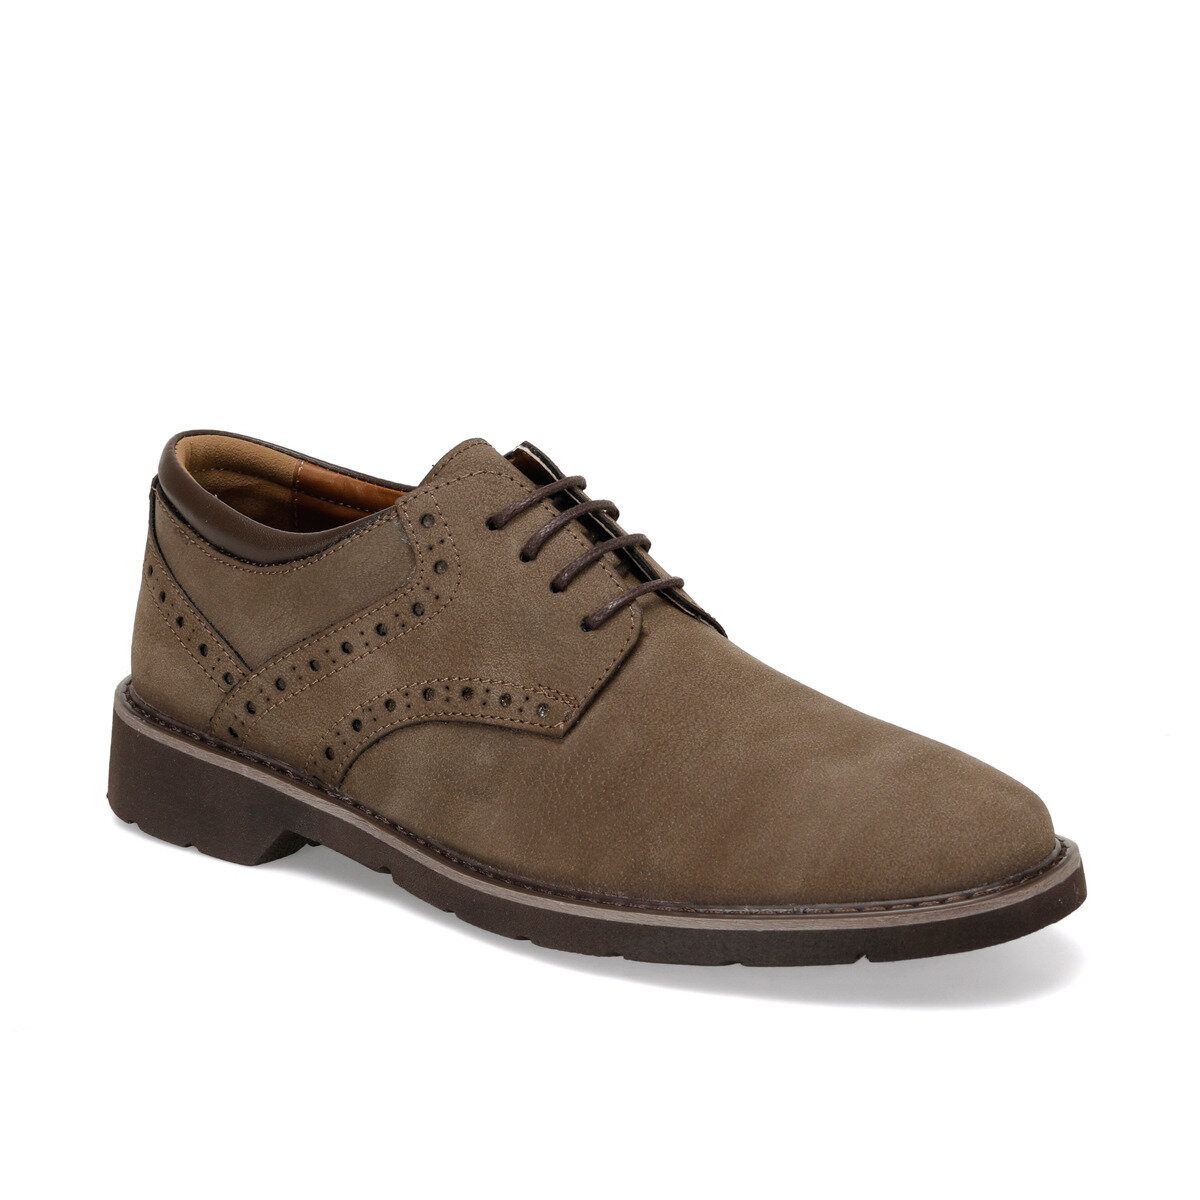 FLO 95142-3 Mink Male Shoes-Styles